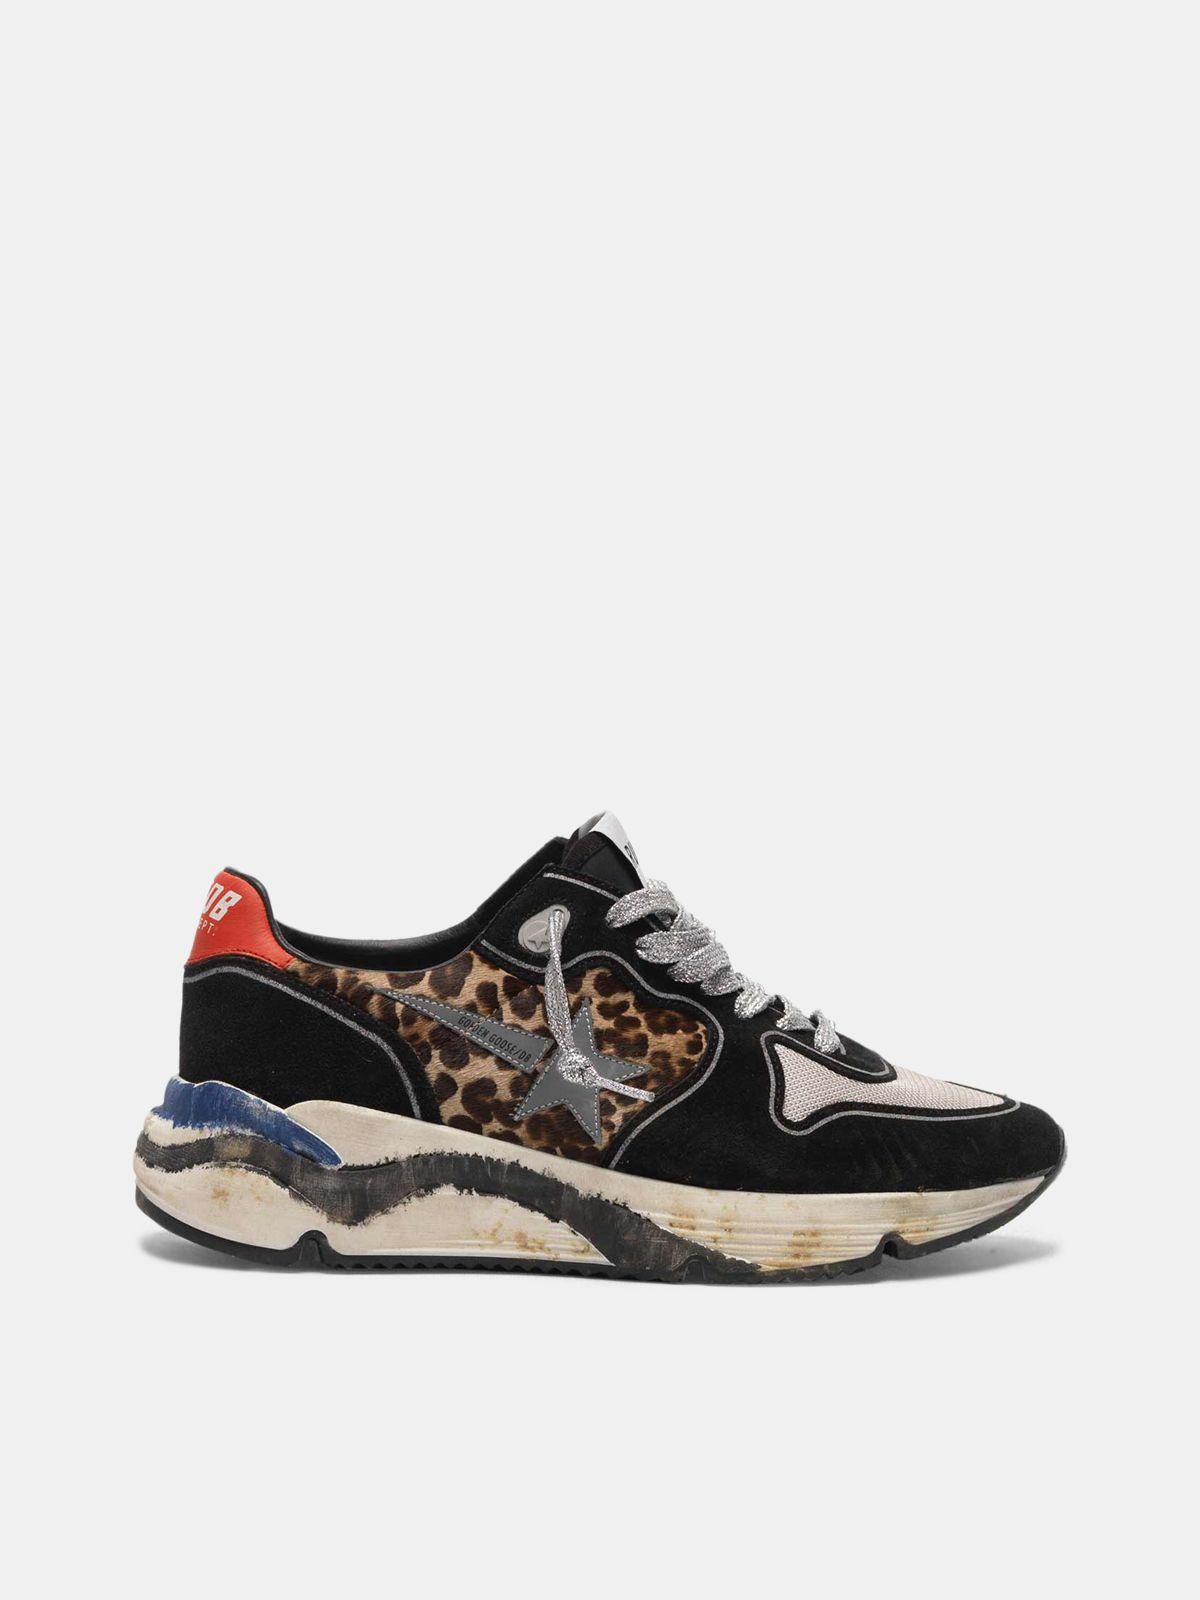 Golden Goose - Sneakers Running Sole in cavallino stampa leopardata e suede in